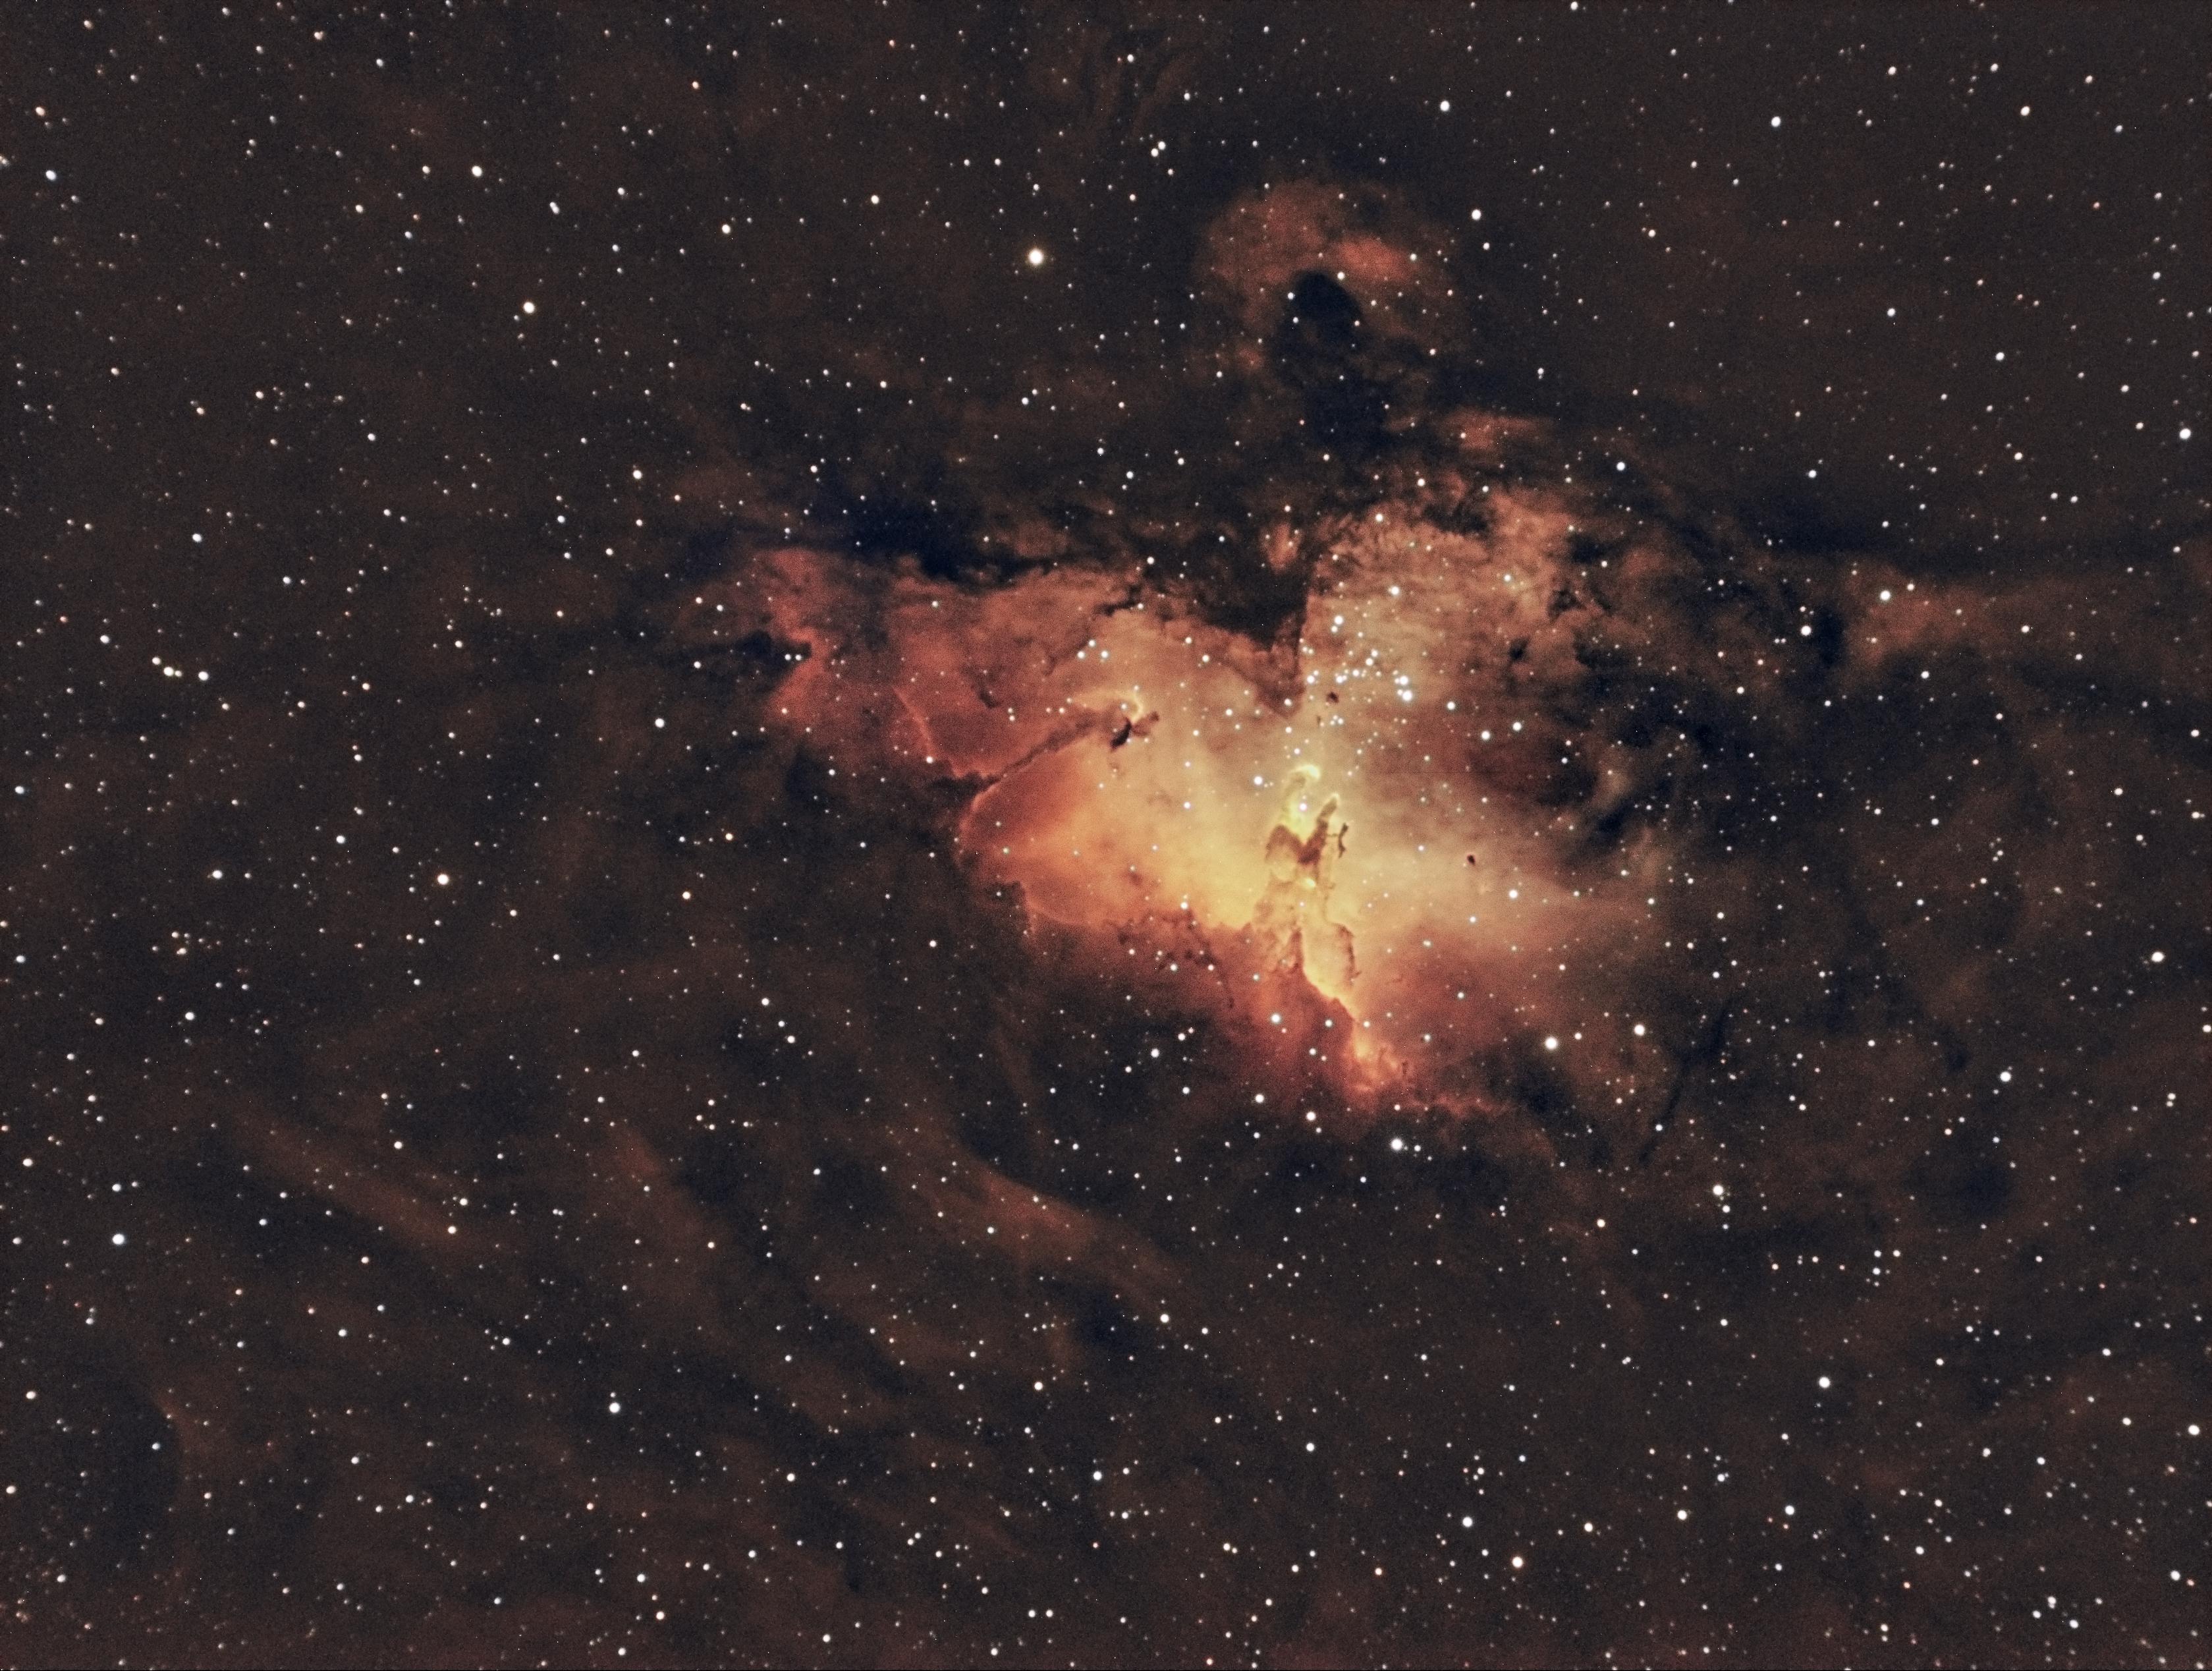 m16 eagle nebula face - photo #38